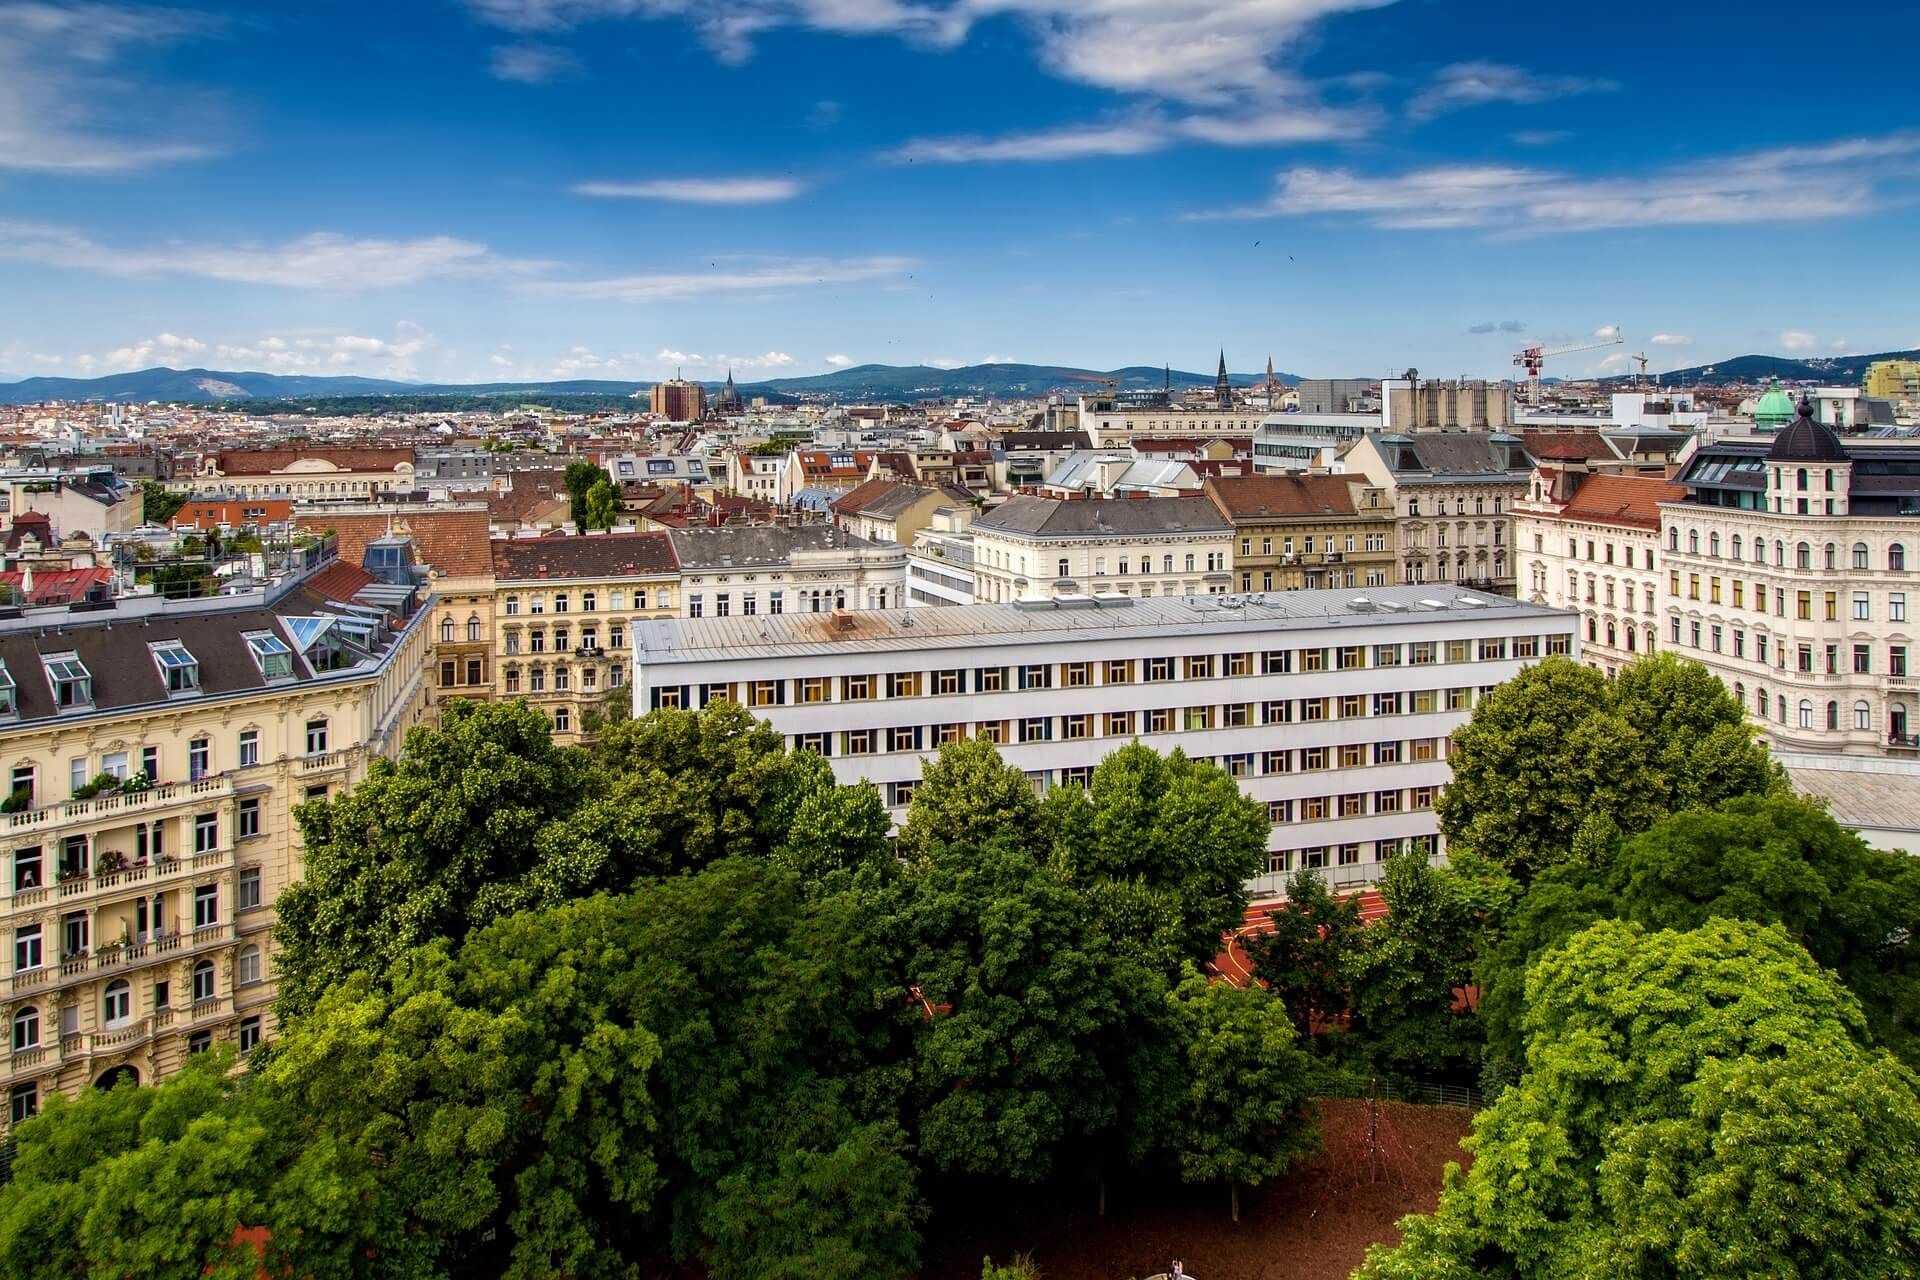 Direktflüge ab Bern nach Wien